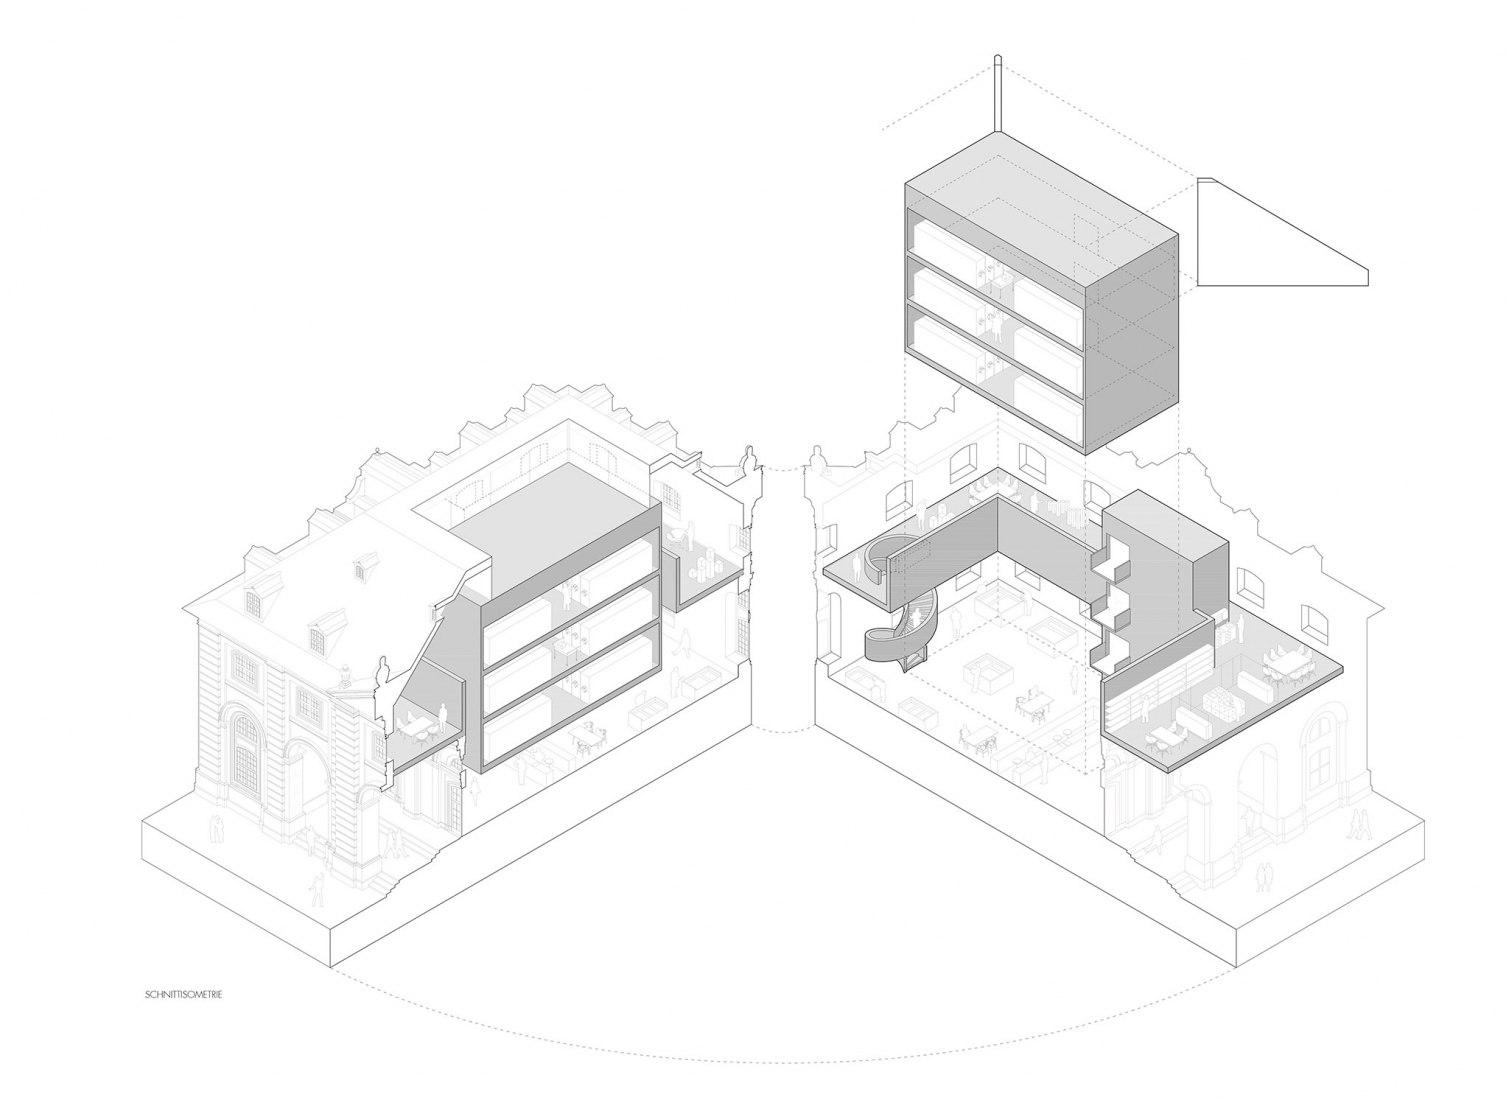 Isometric section. Archiv der Avantgarde by Nieto Sobejano. Image courtesy of Nieto Sobejano